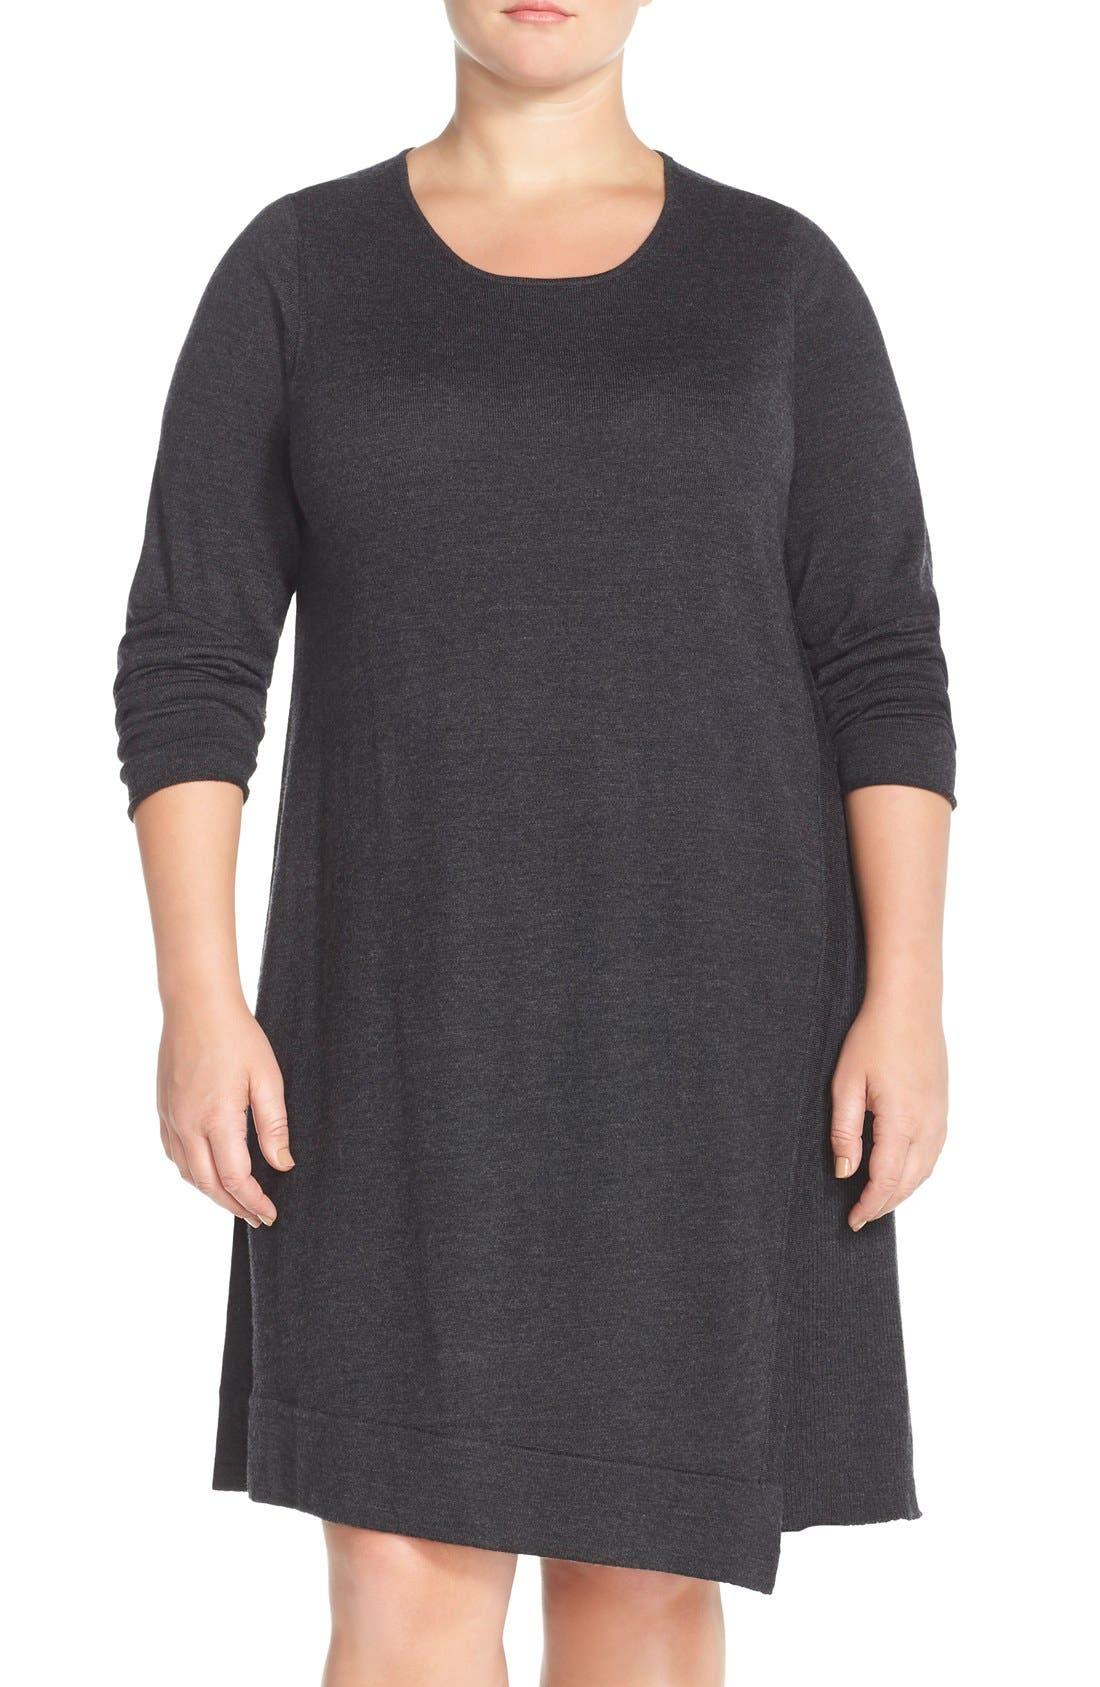 Alternate Image 1 Selected - Eileen Fisher Merino Jersey Jewel Neck Dress (Plus Size)